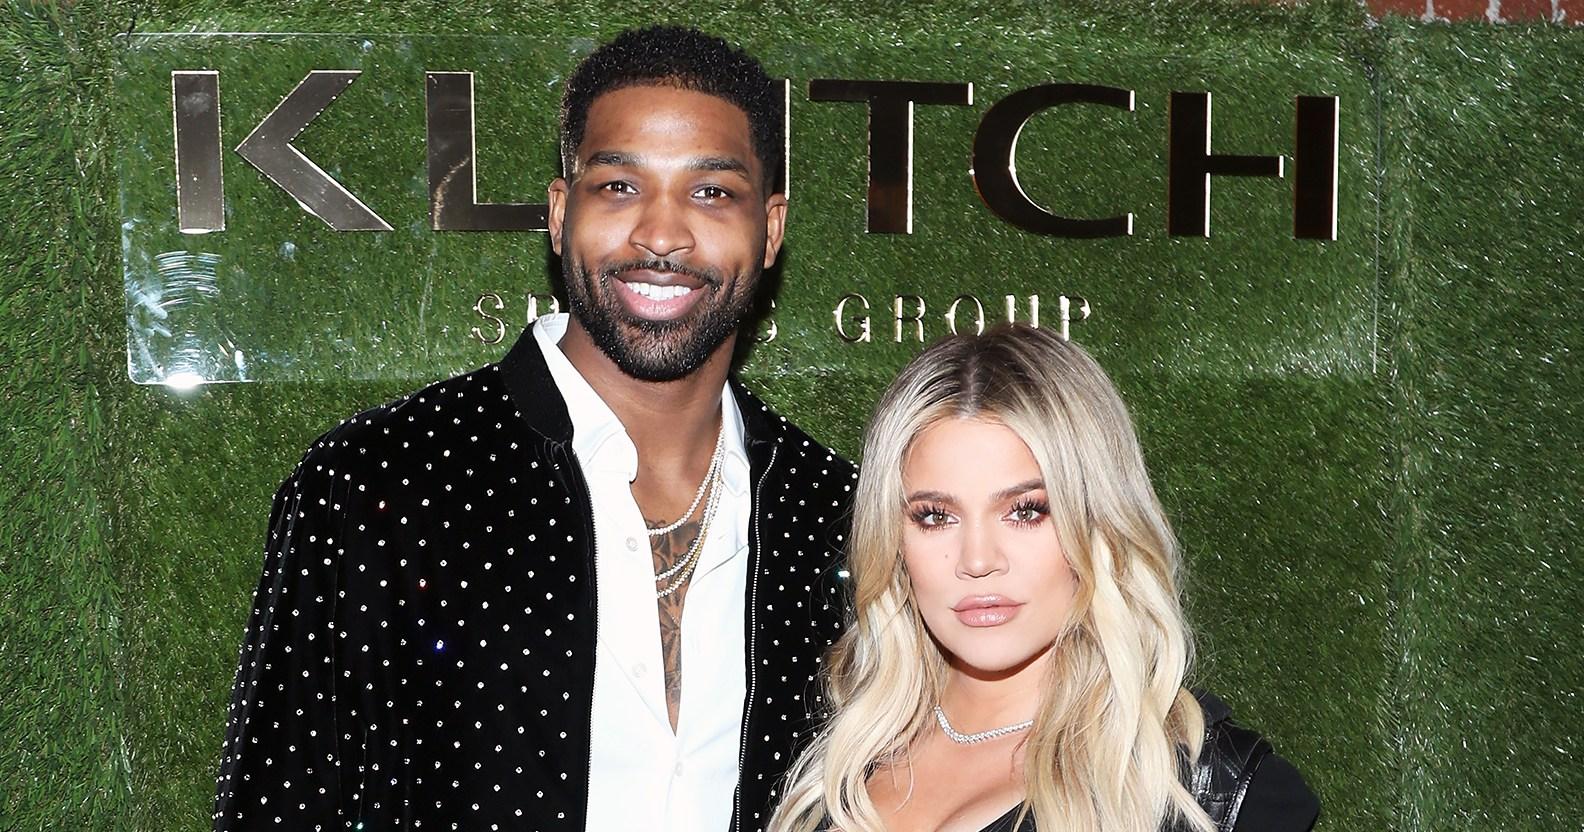 Khloe Kardashian Reacts to Tristan Thompson Cheating on 'KUWTK'